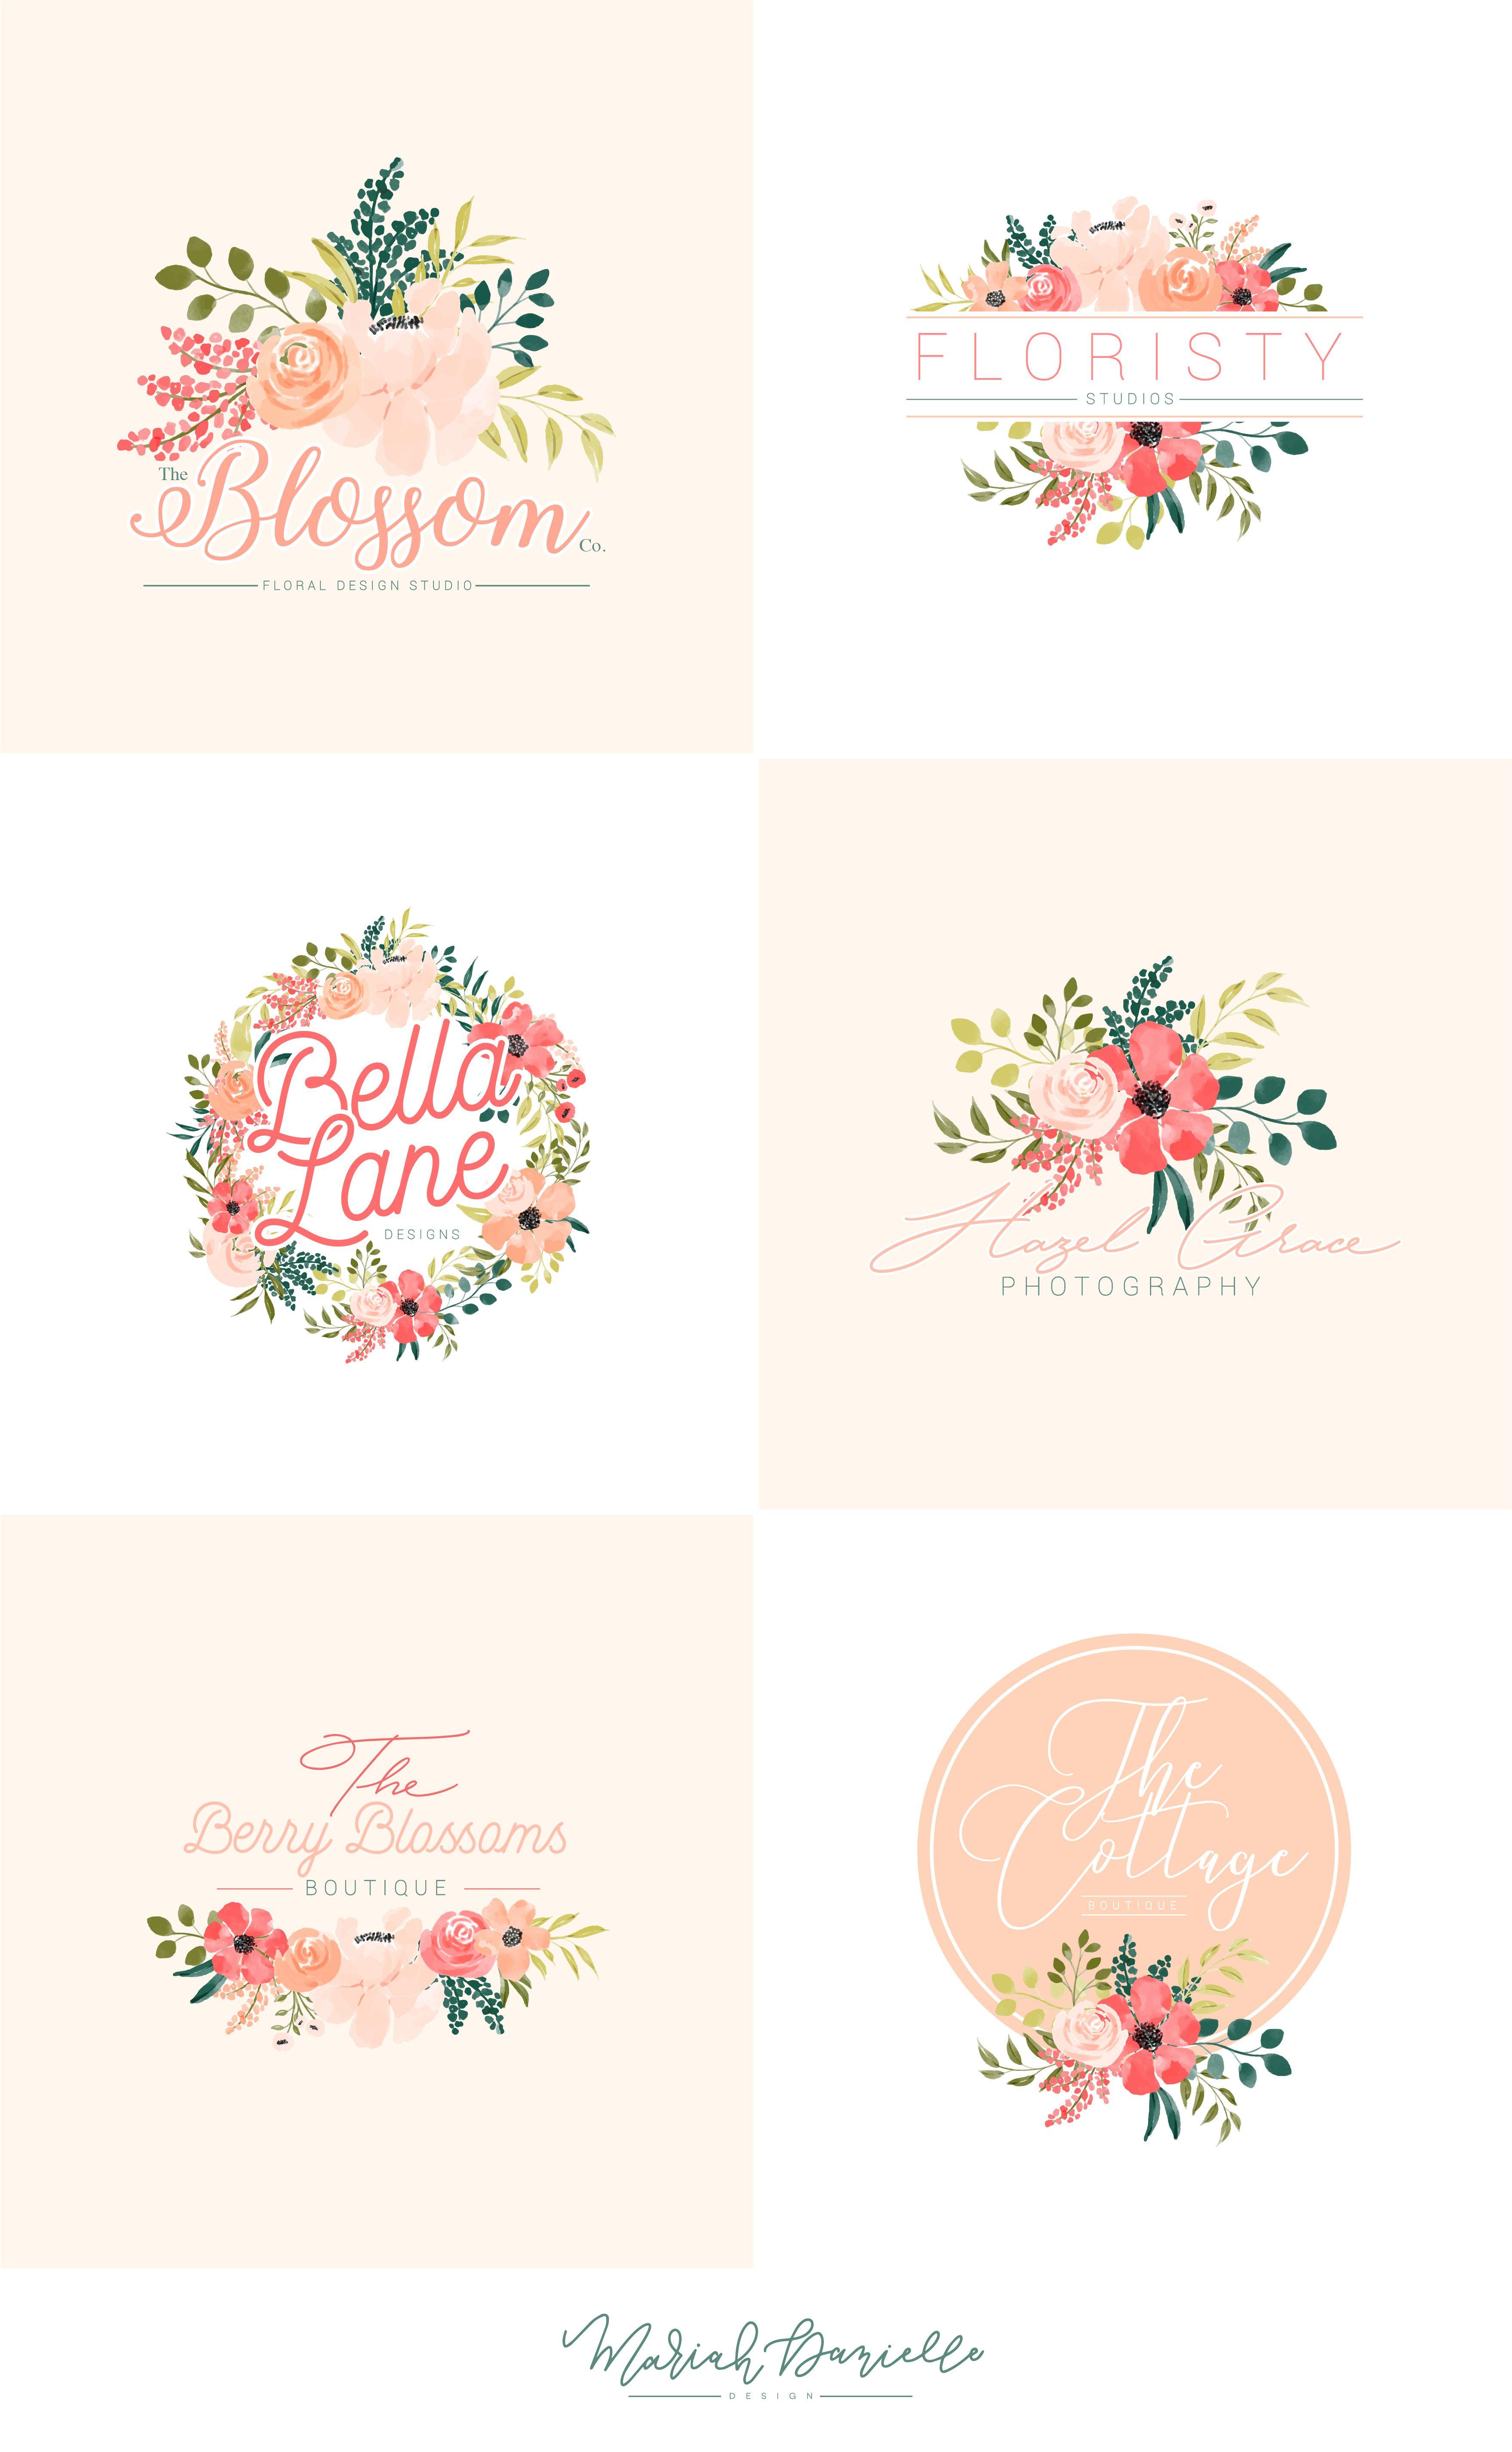 Peach Posey Floral Premade Logos Illustrations Hand Drawn Floral Illustrations Diy Wedding Floral Illustrations Branding Design Logo Logo Illustration